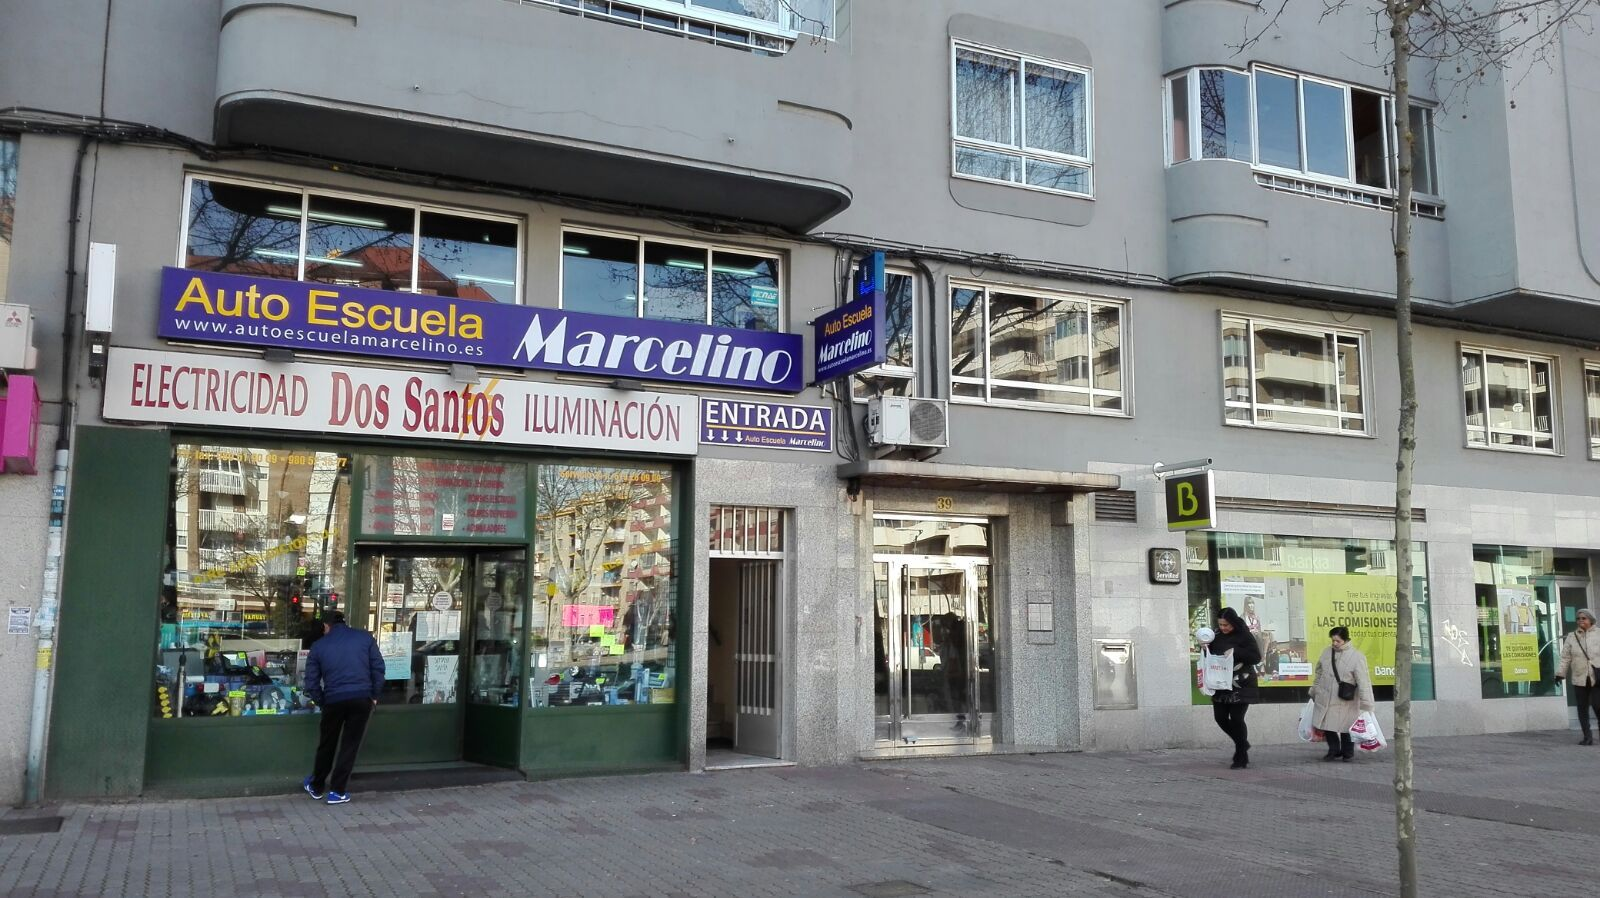 AUTO ESCUELA MARCELINO